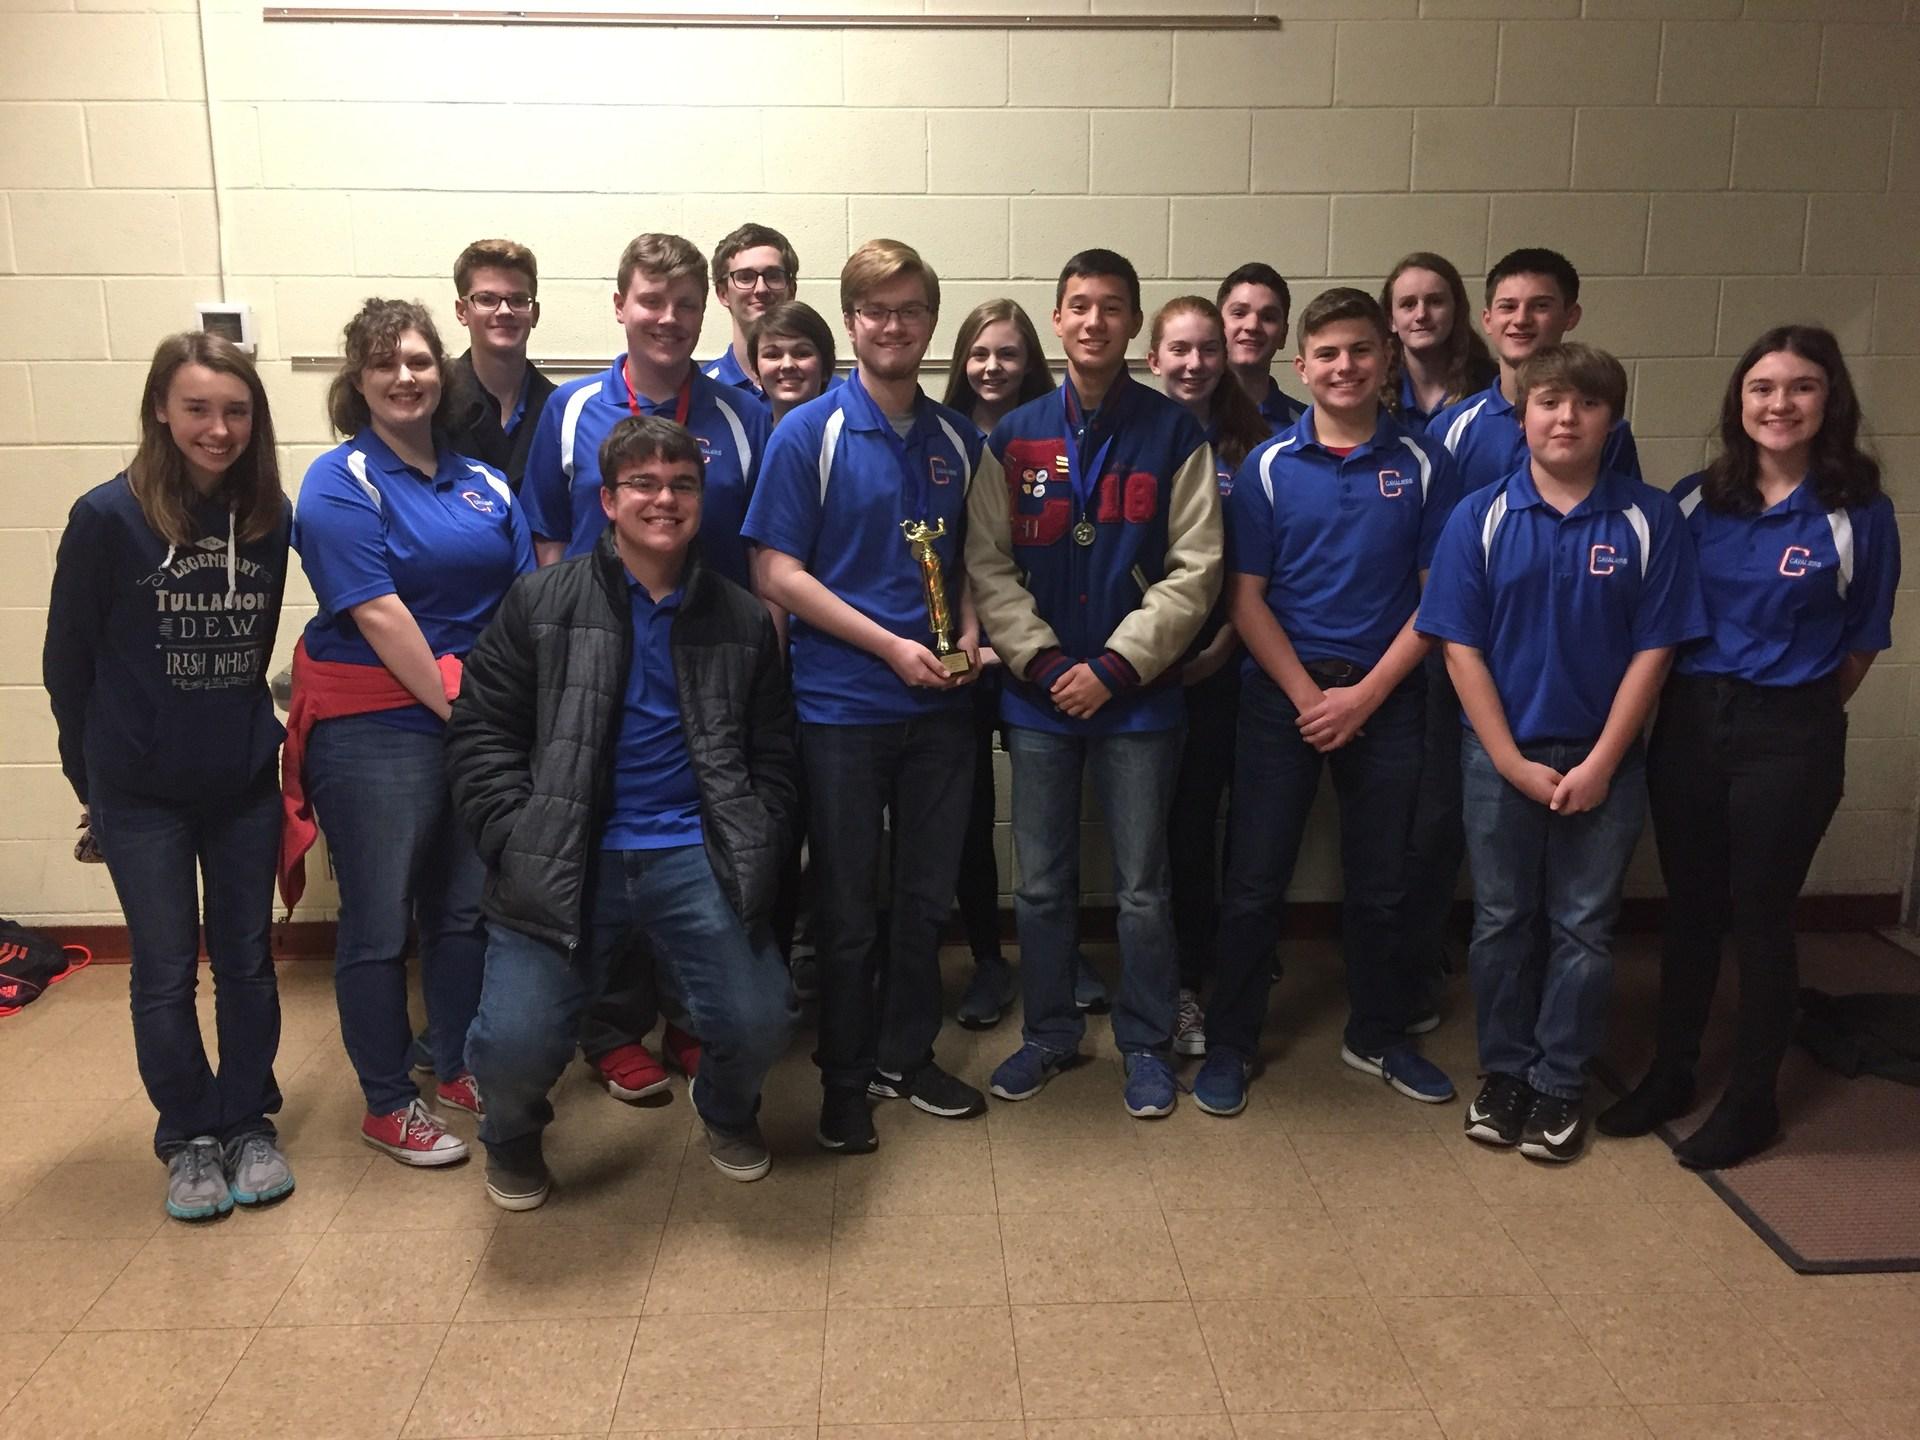 Carlinville High School Scholastic Bowl Team